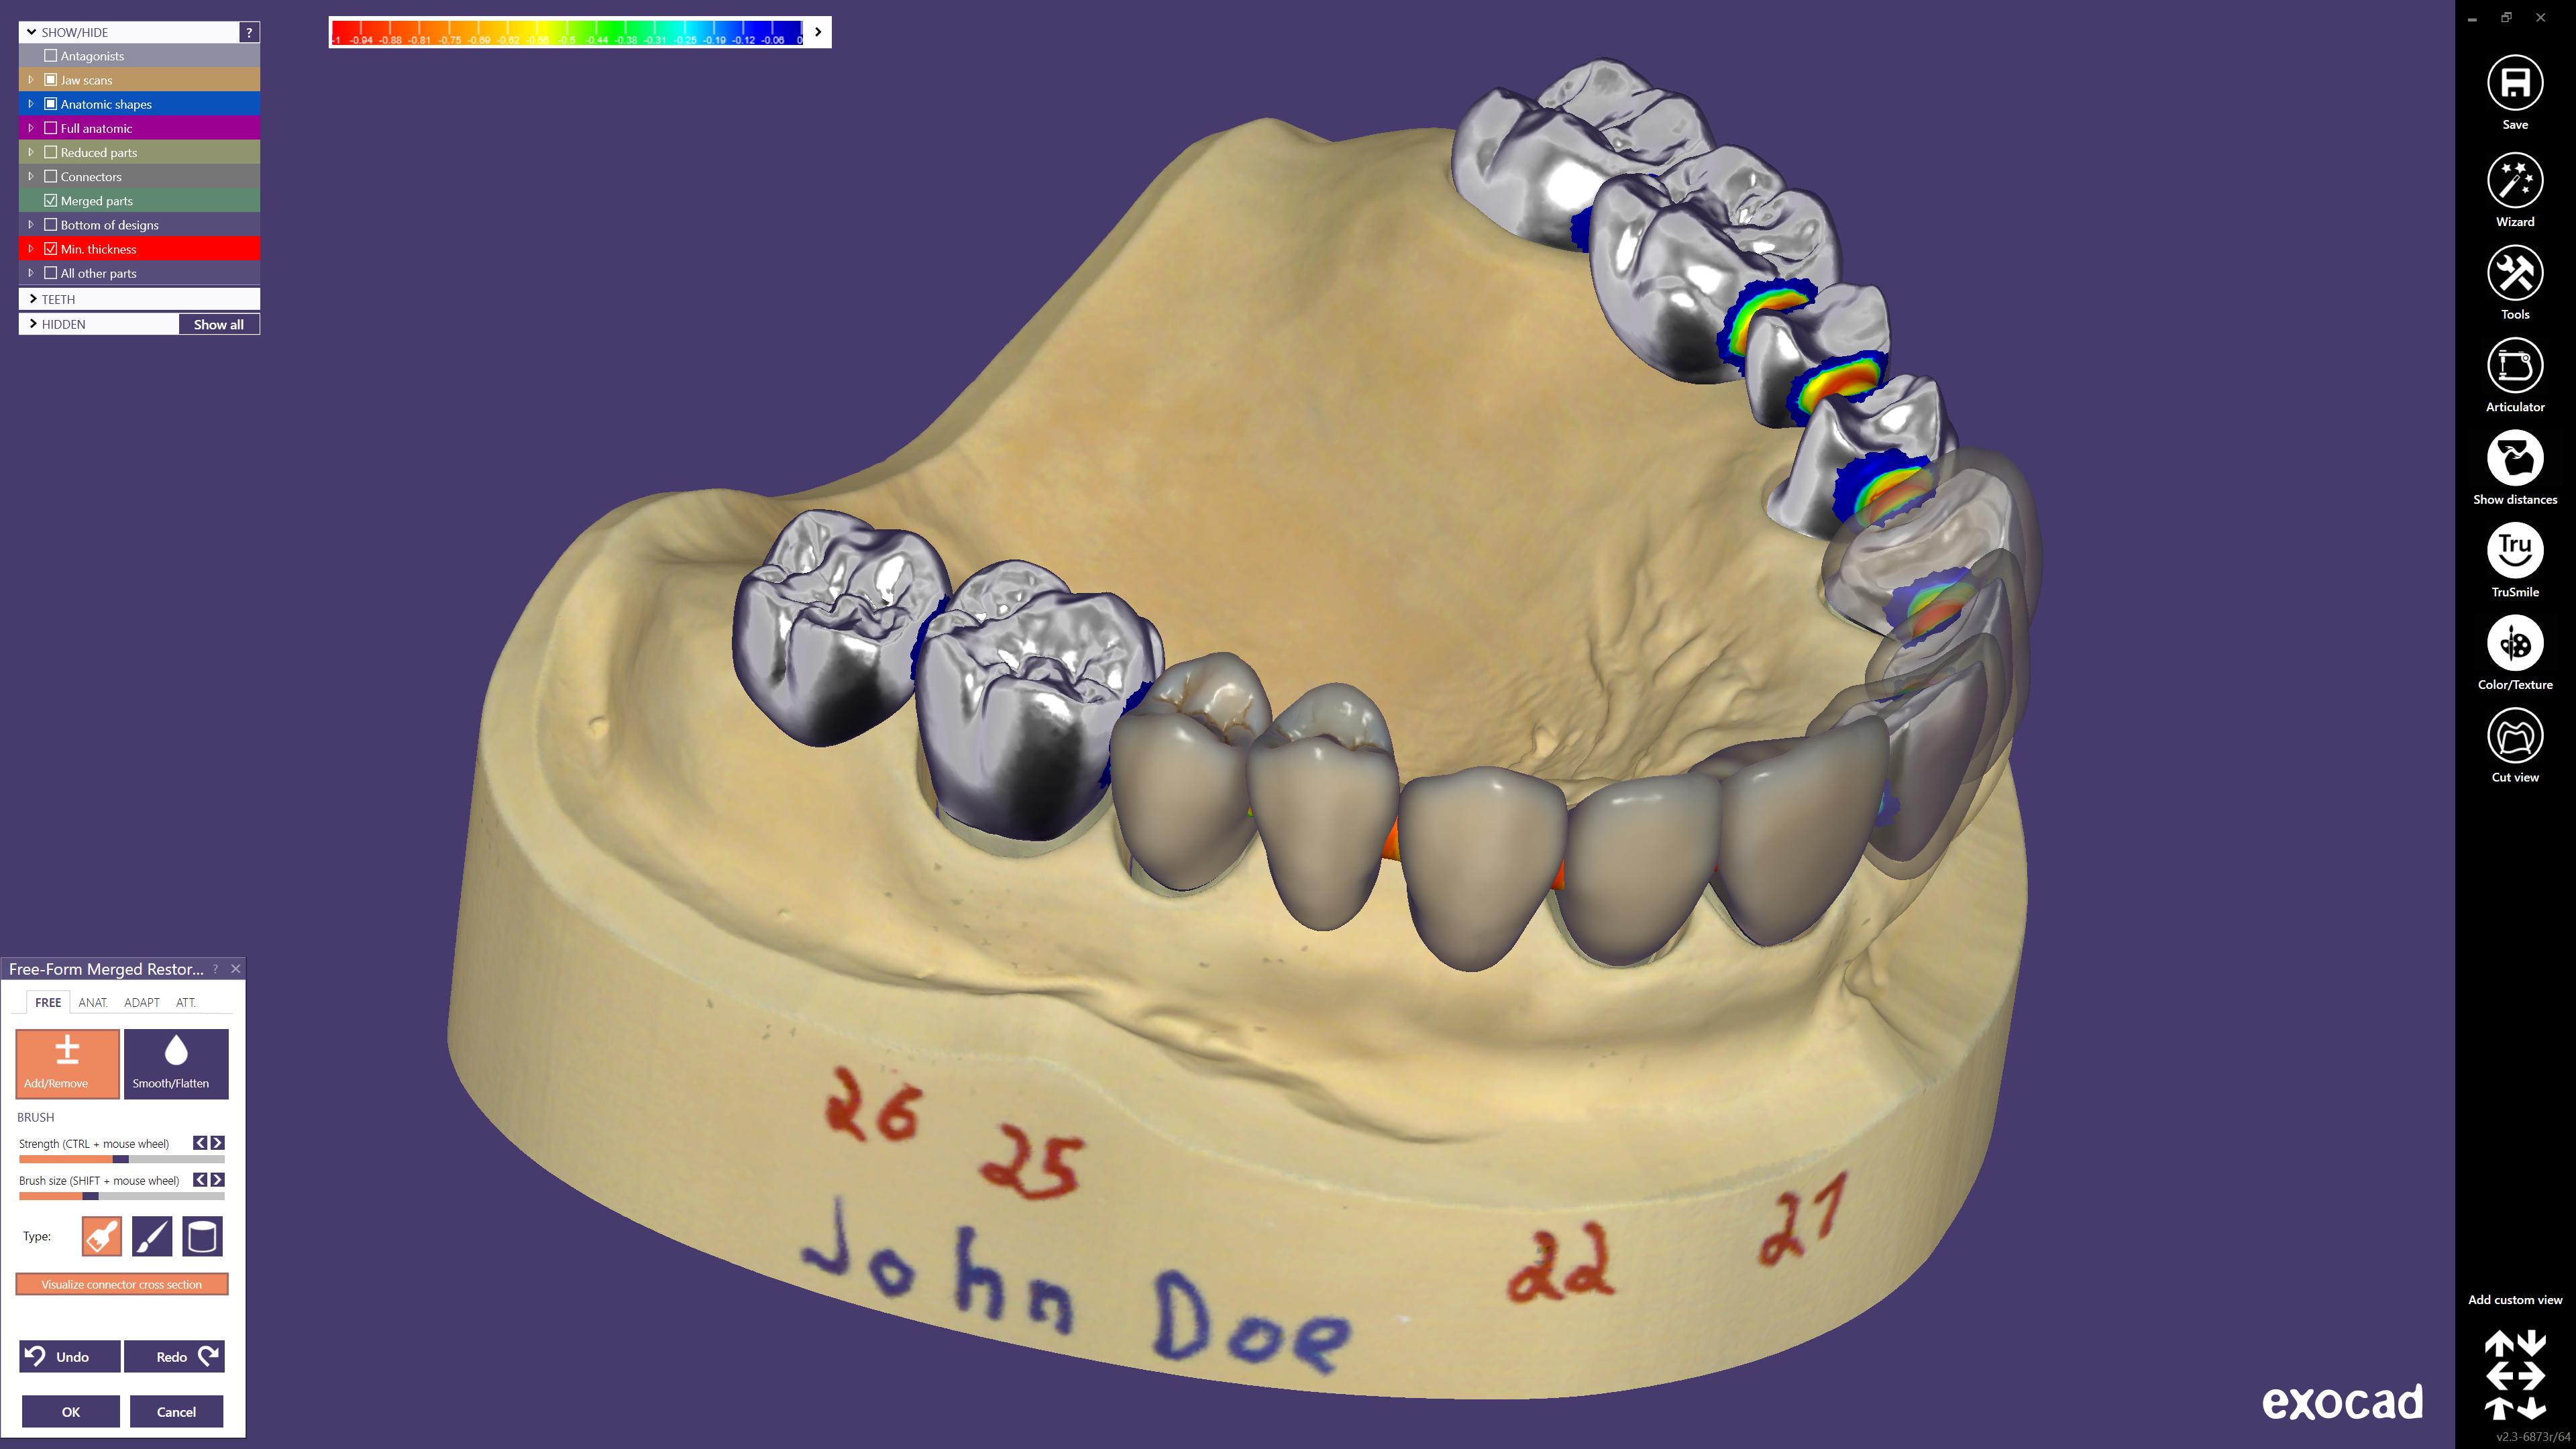 exocad-DentalCAD-Page-05-Preview